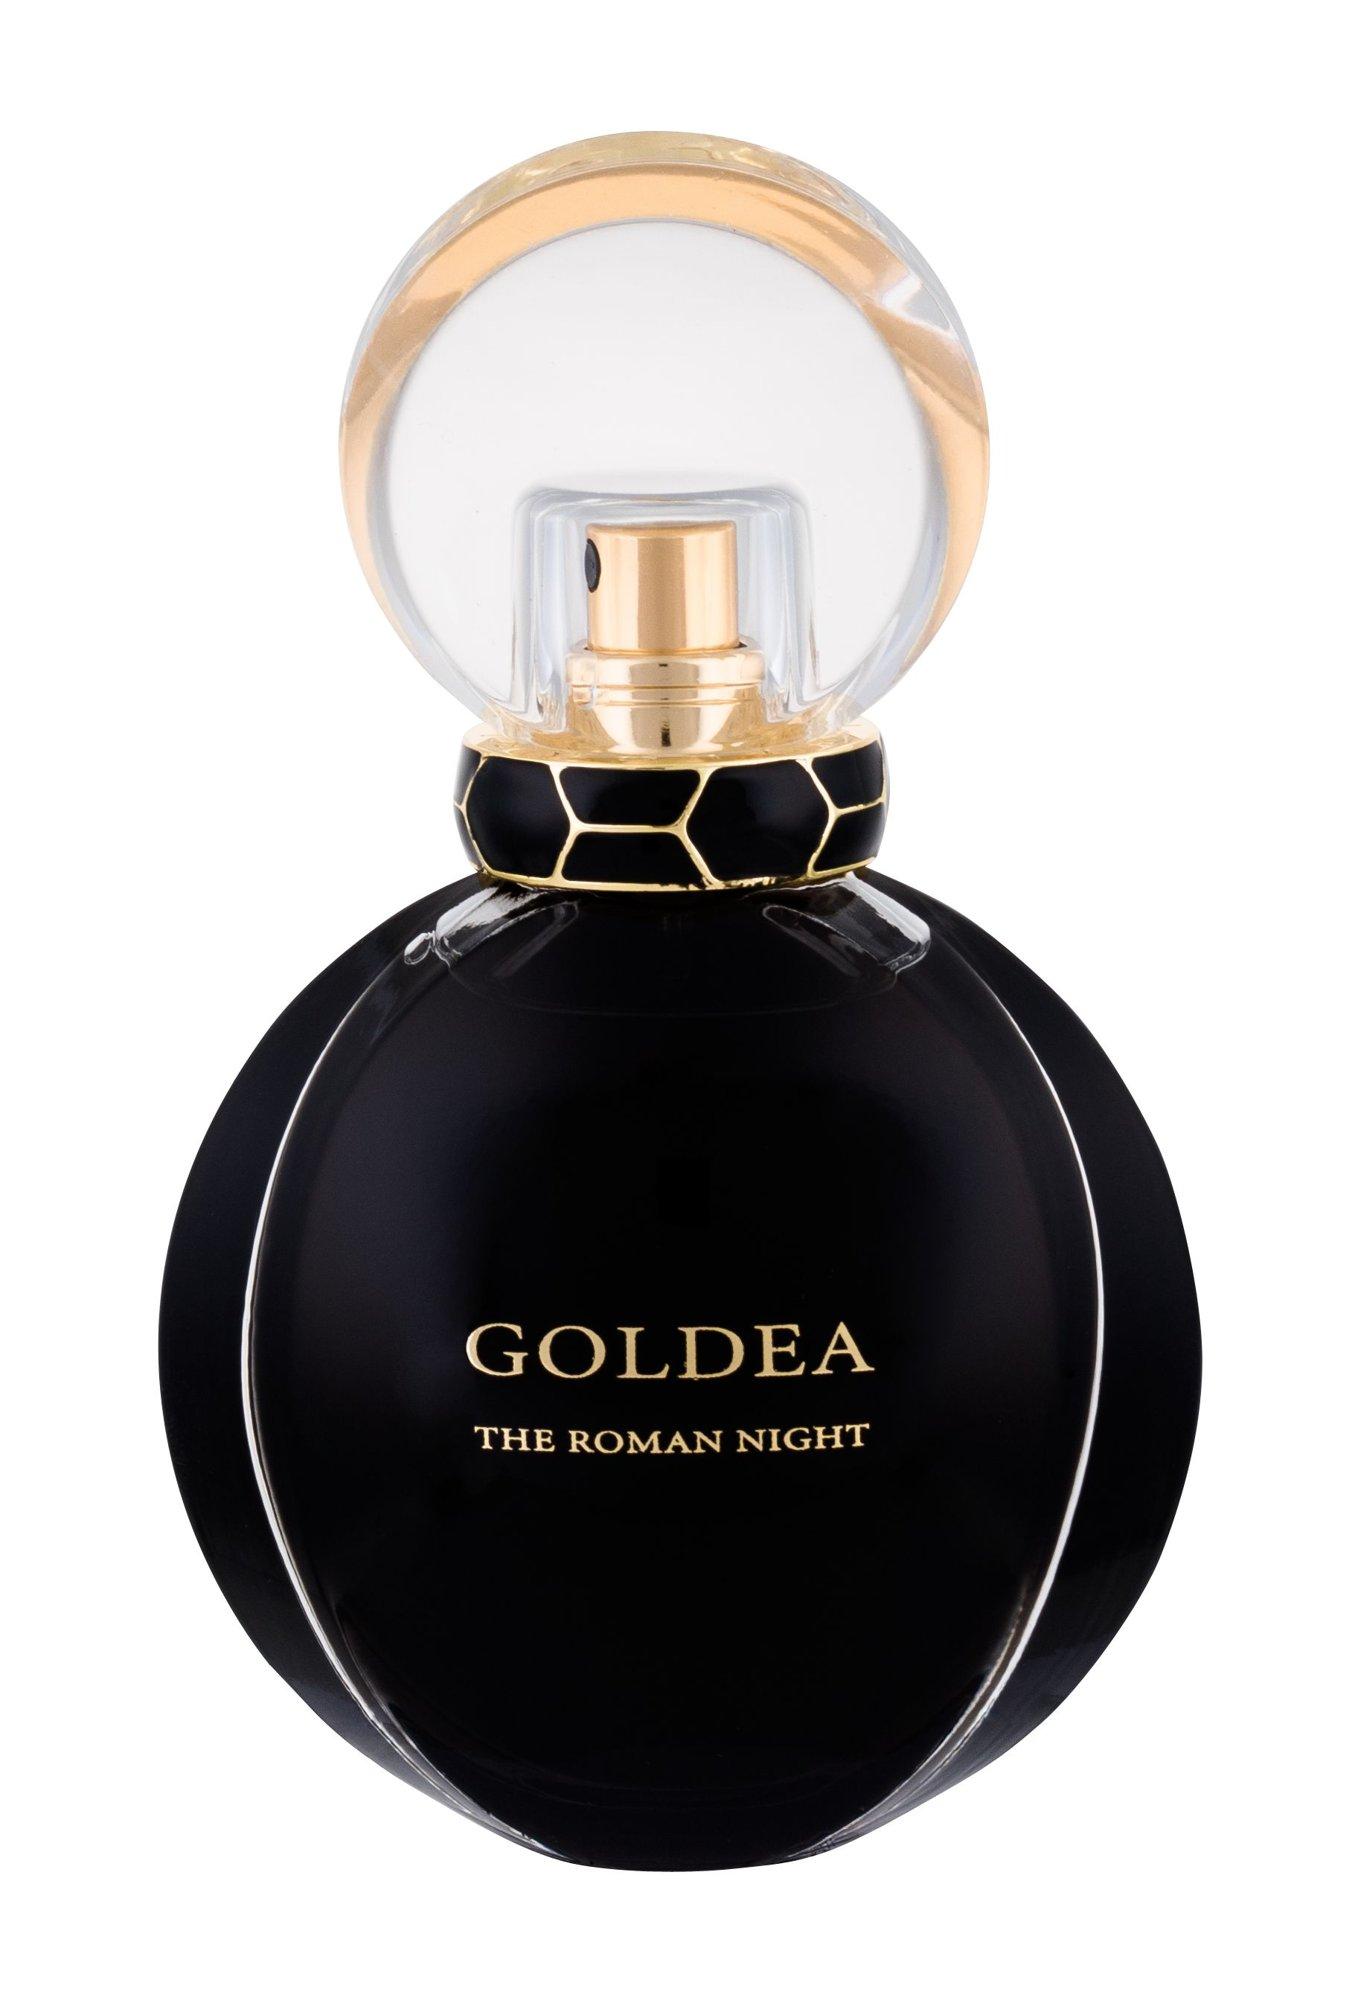 Bvlgari Goldea The Roman Night, Parfumovaná voda 30ml